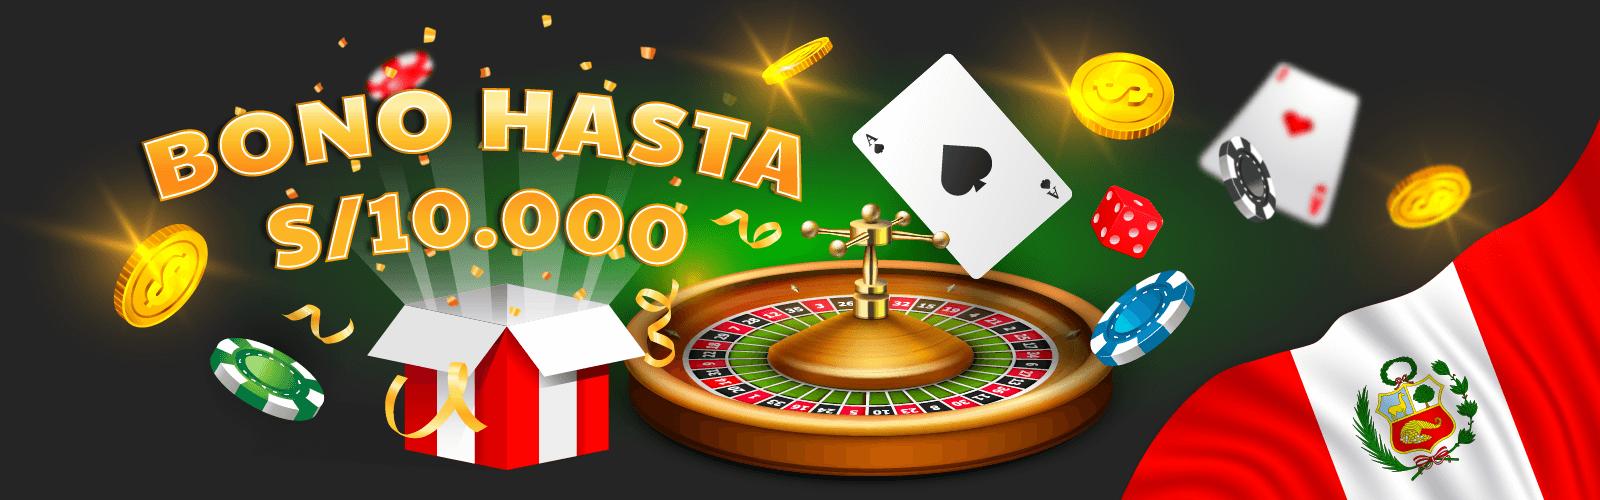 Bonos de casinos online para jugadores peruanos